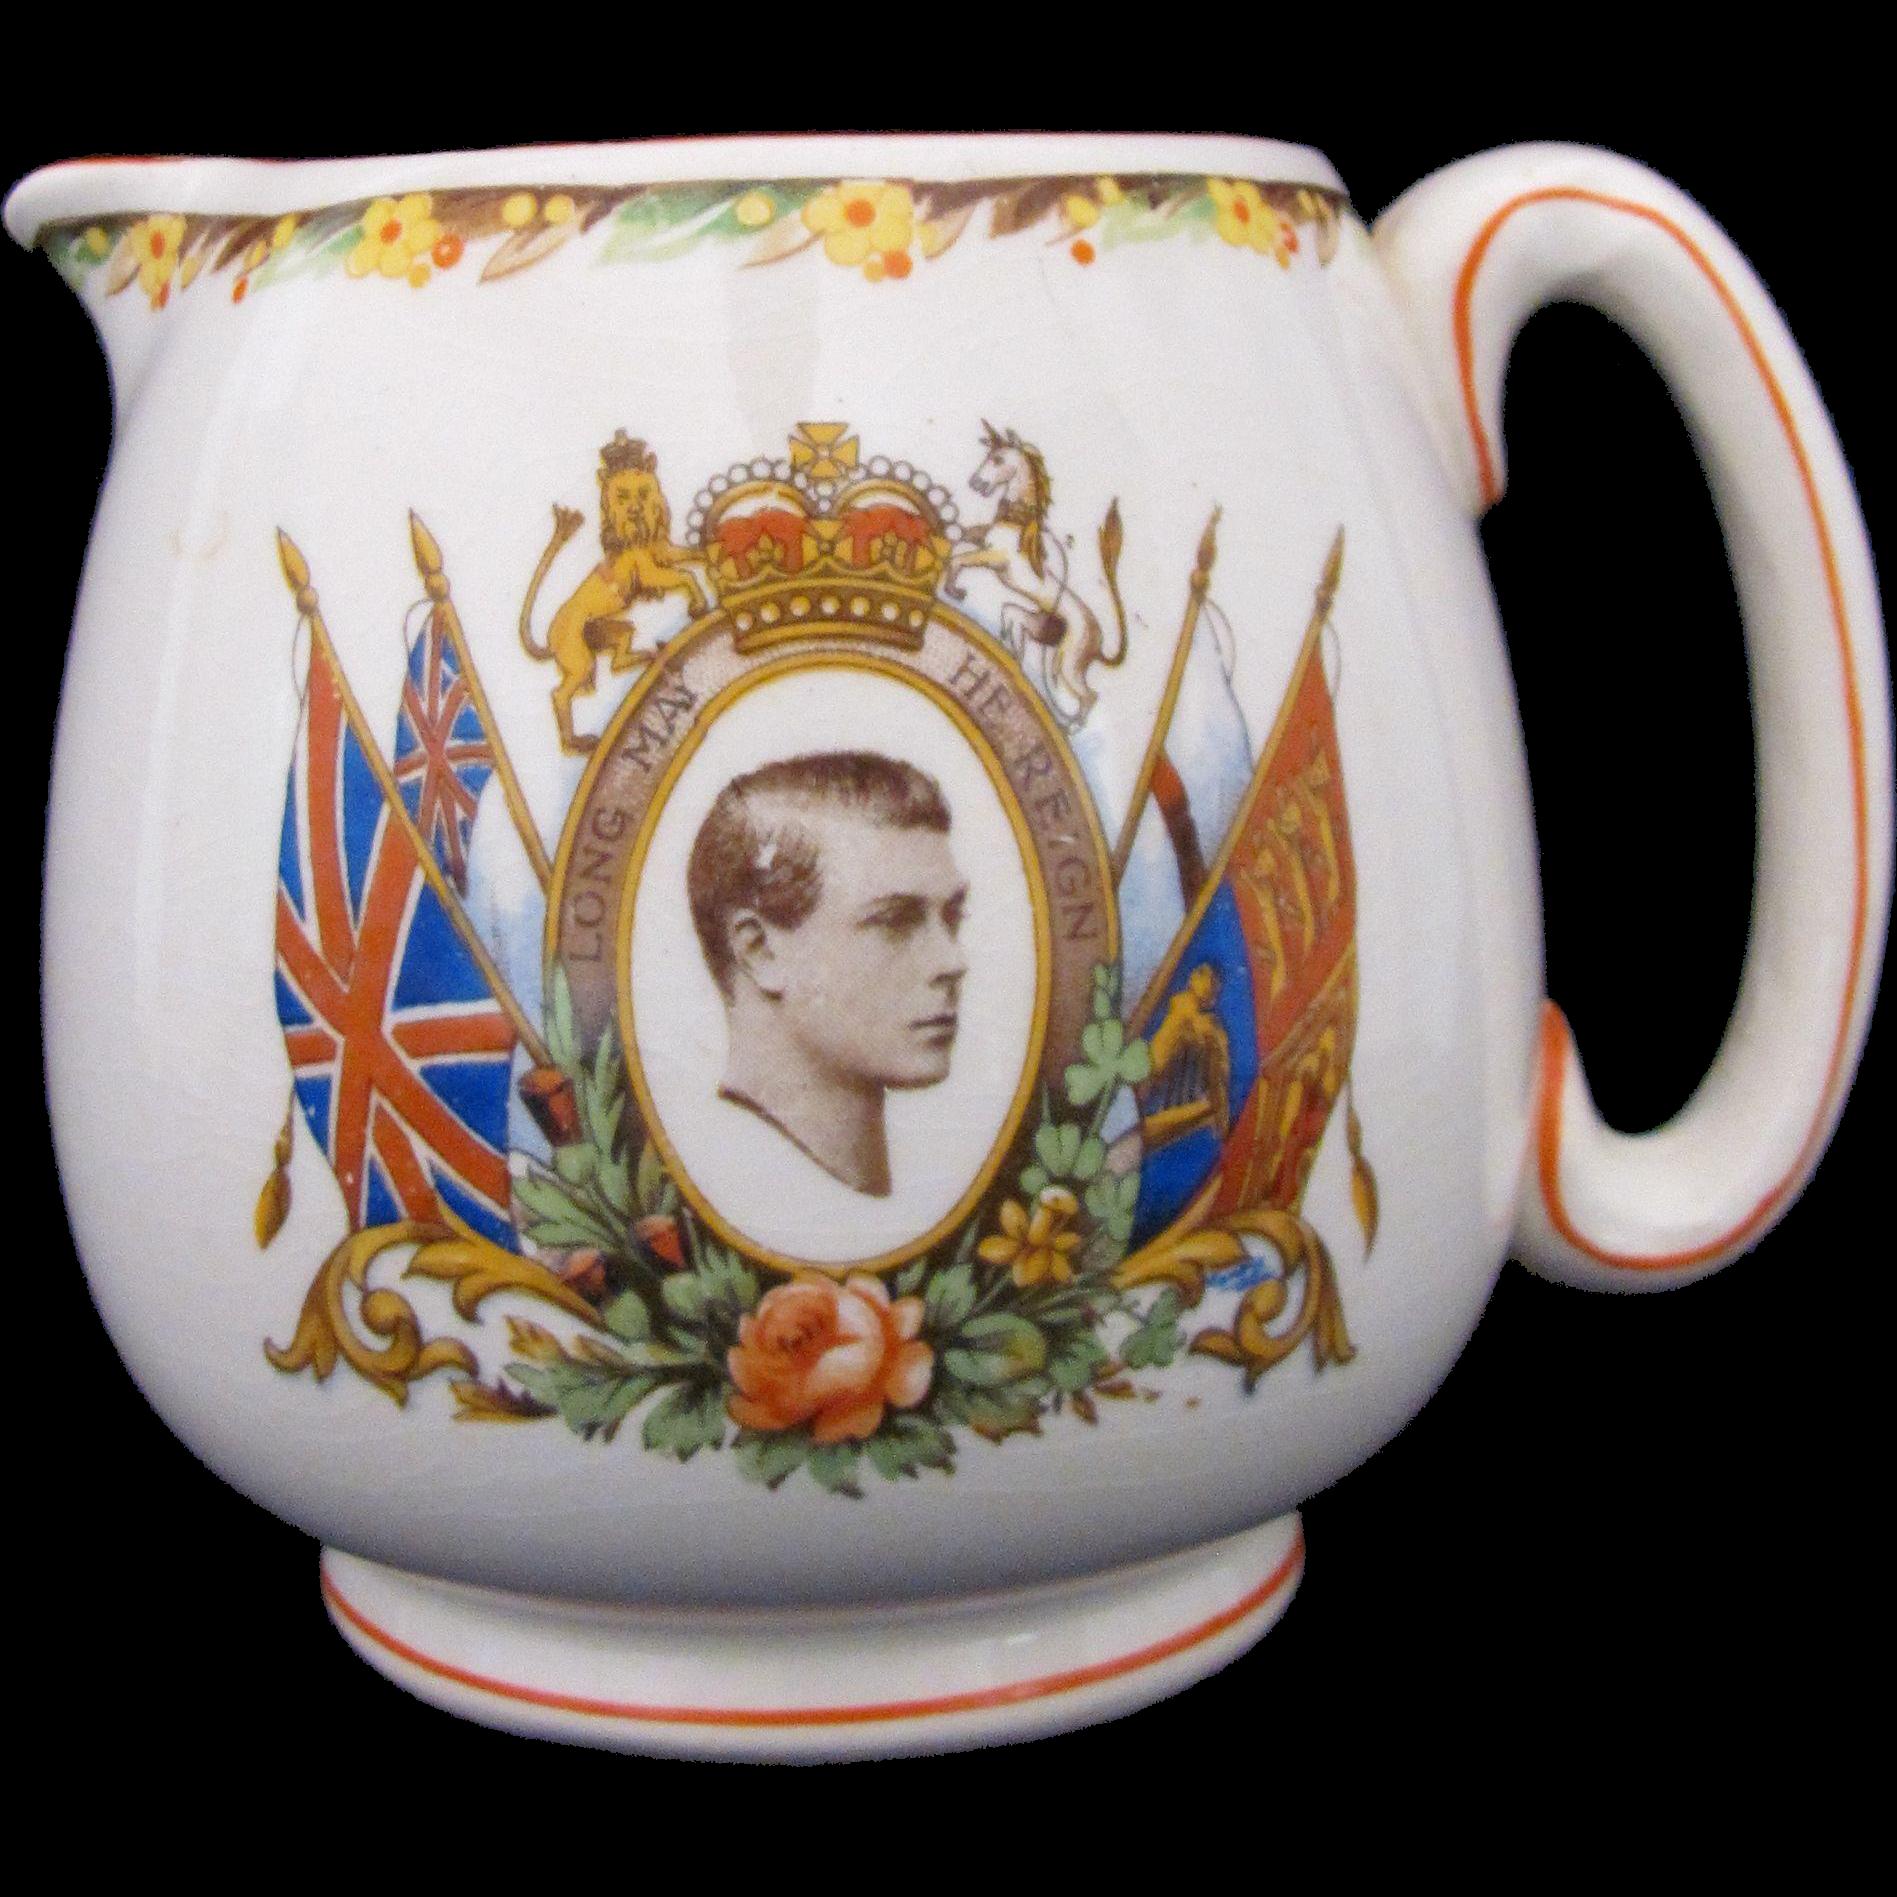 RARE King Edward VIII Coronation Souvenir Pitcher Jug CWS Longton c.1936-1937